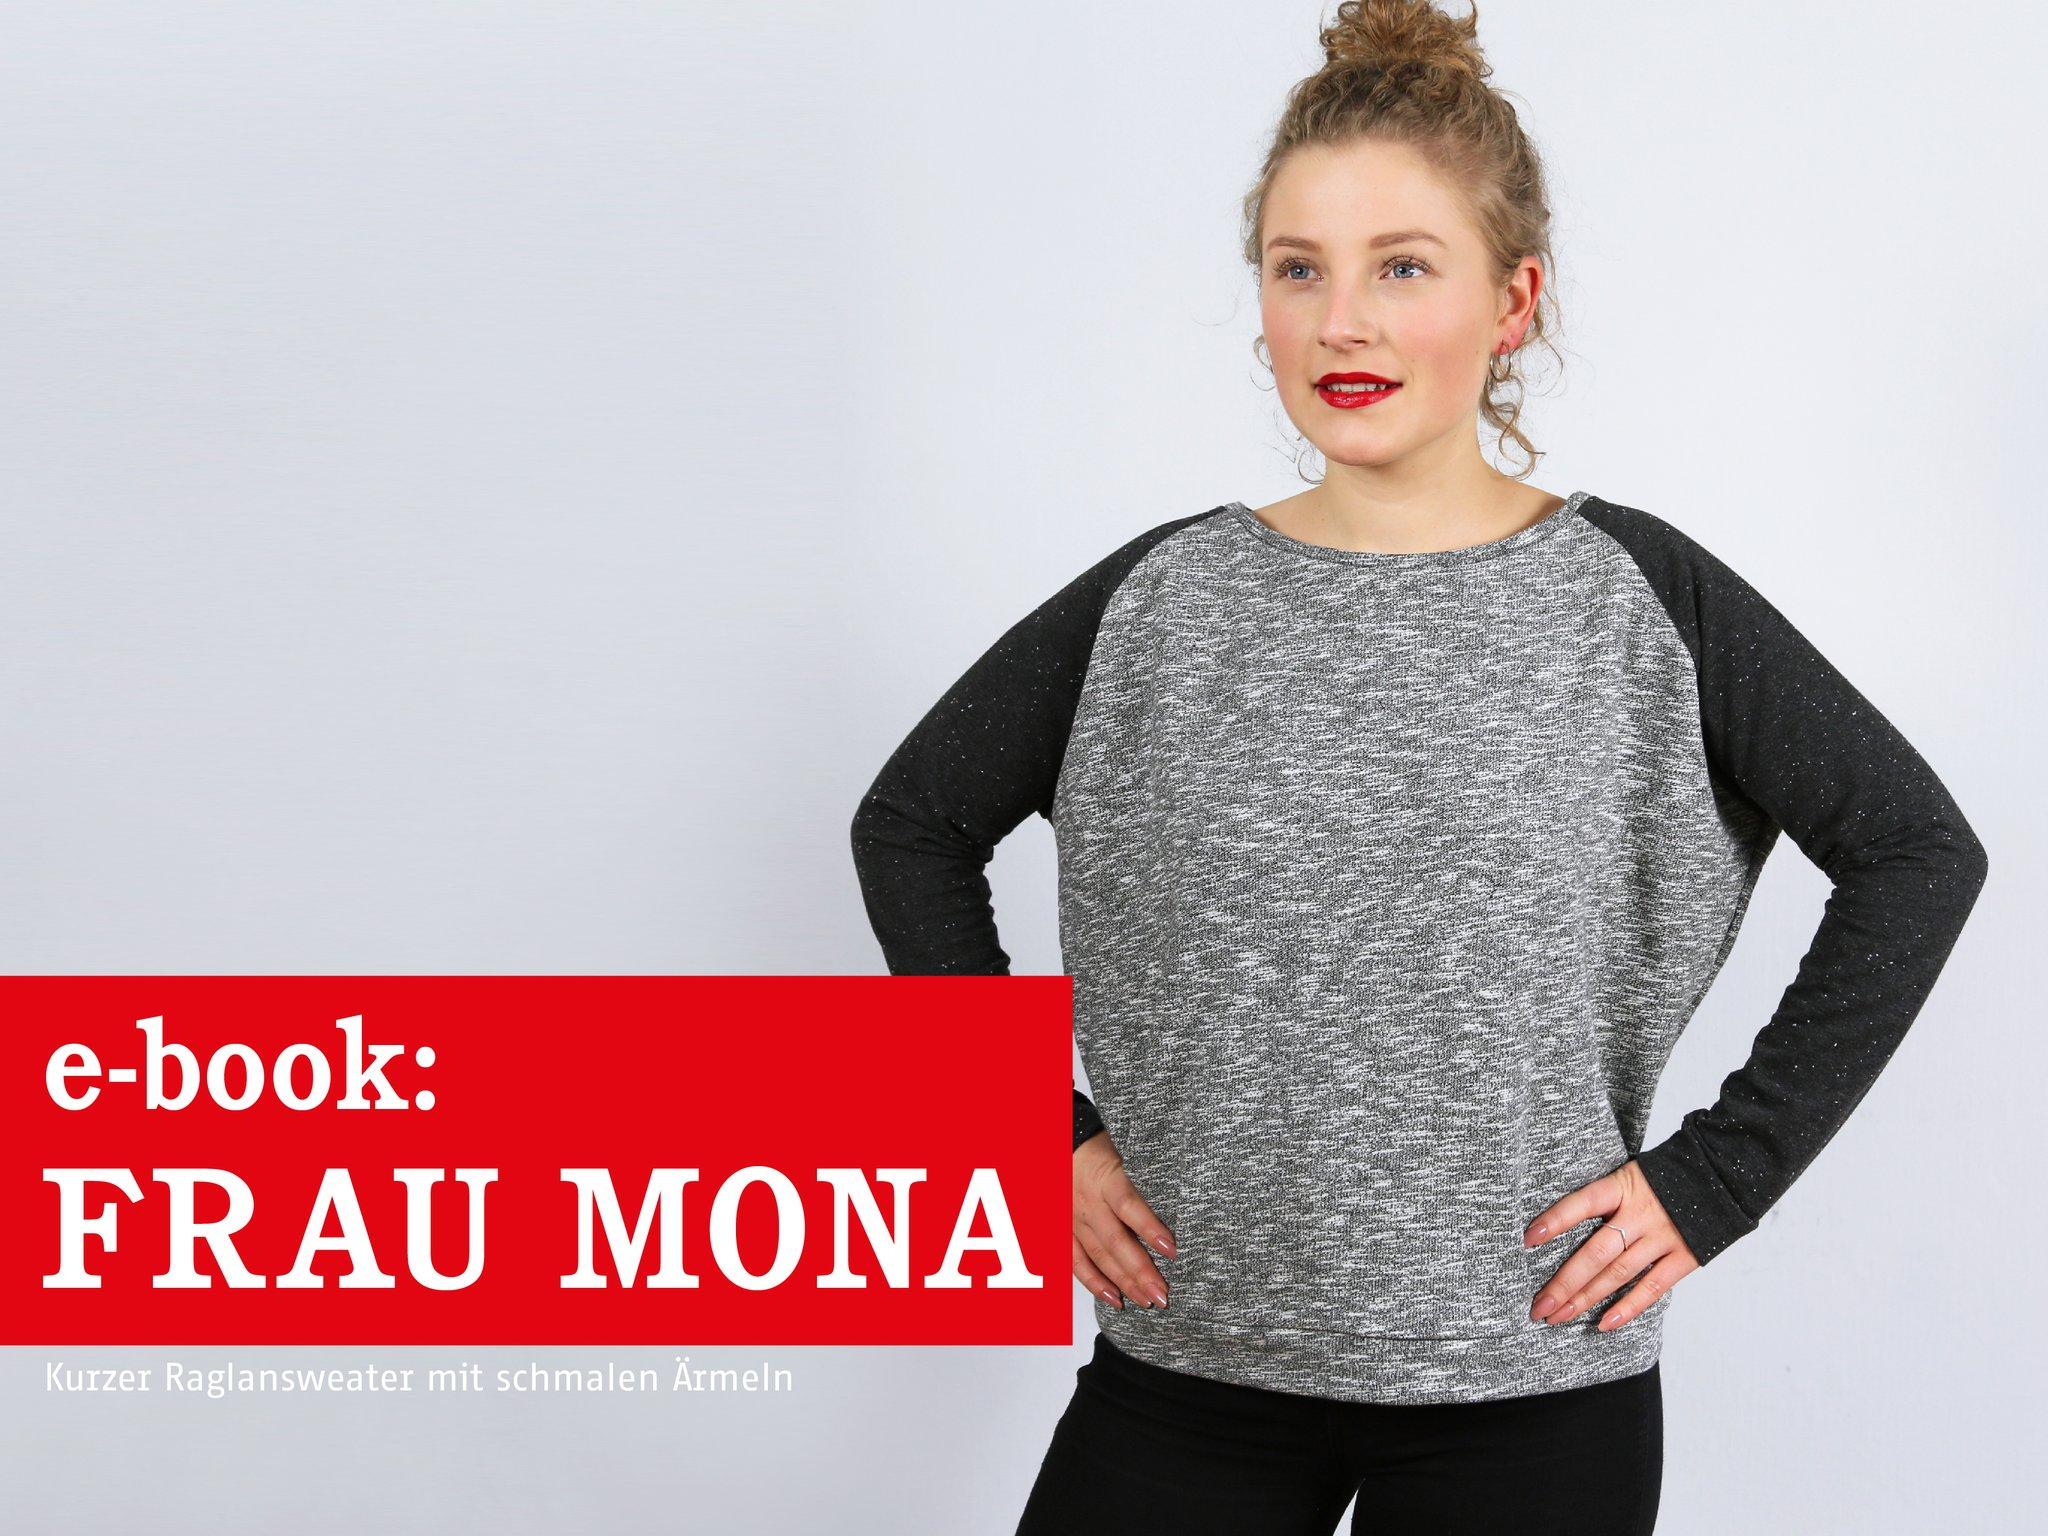 FRAU MONA • Raglansweater, e-book